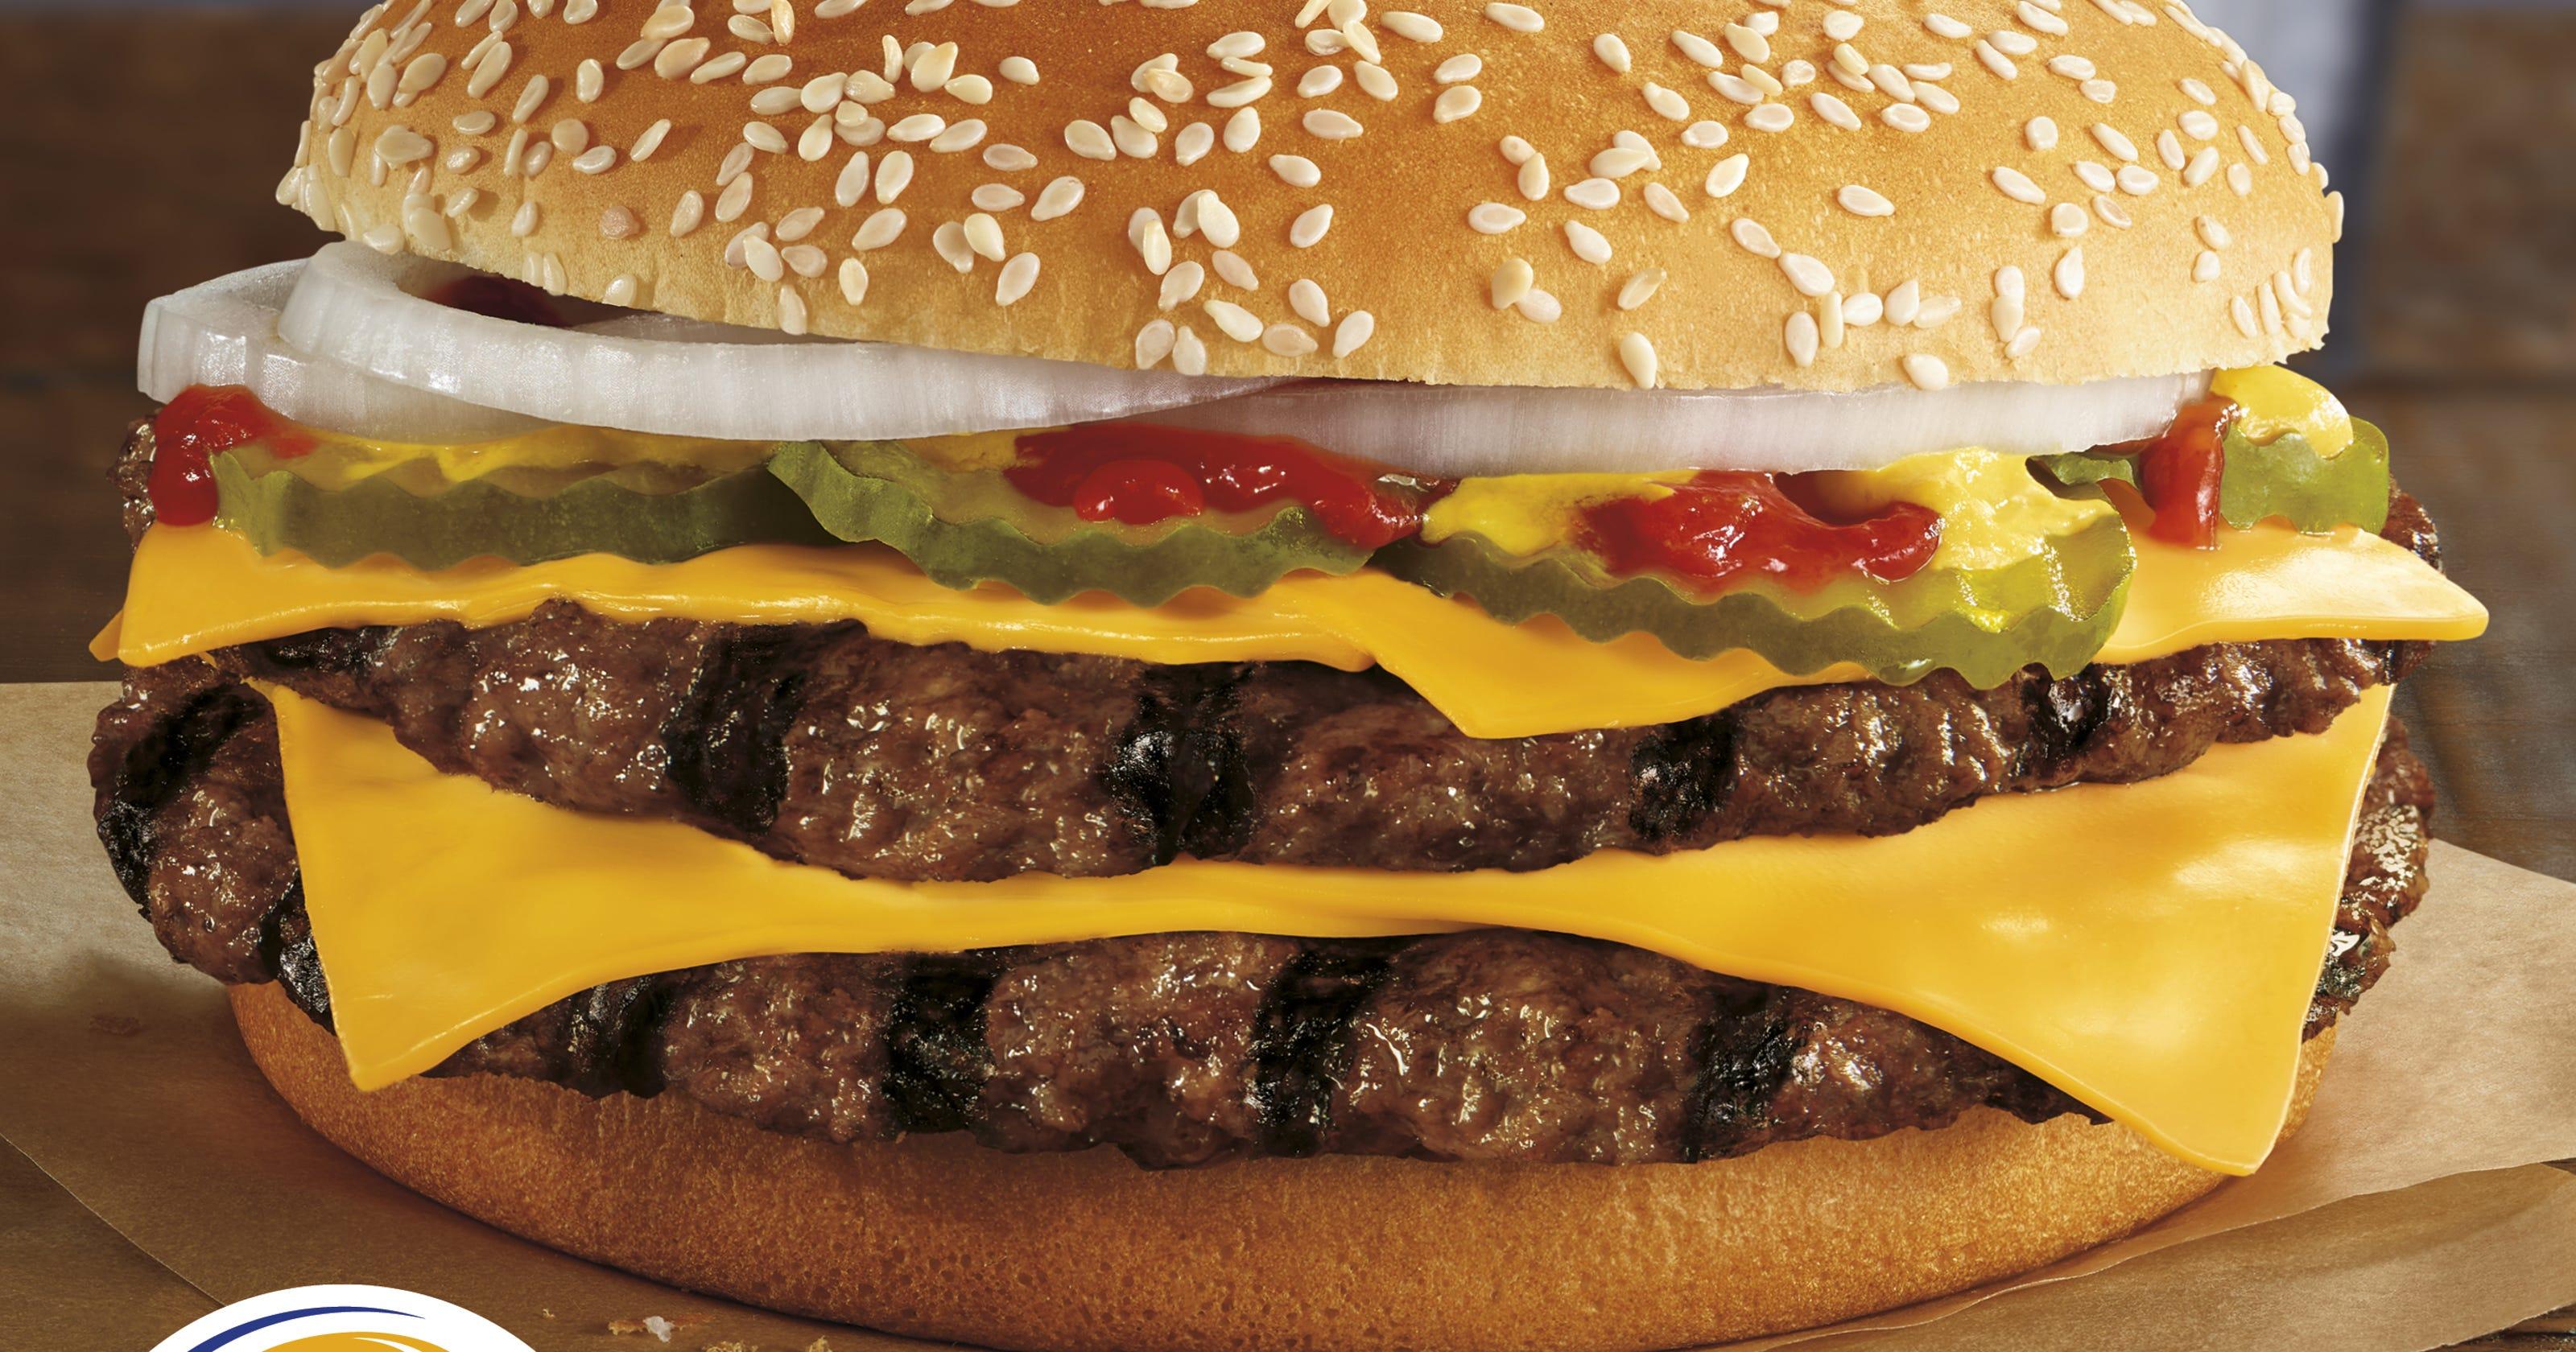 Burger King takes swat at McDonald's with new gut bomb burger